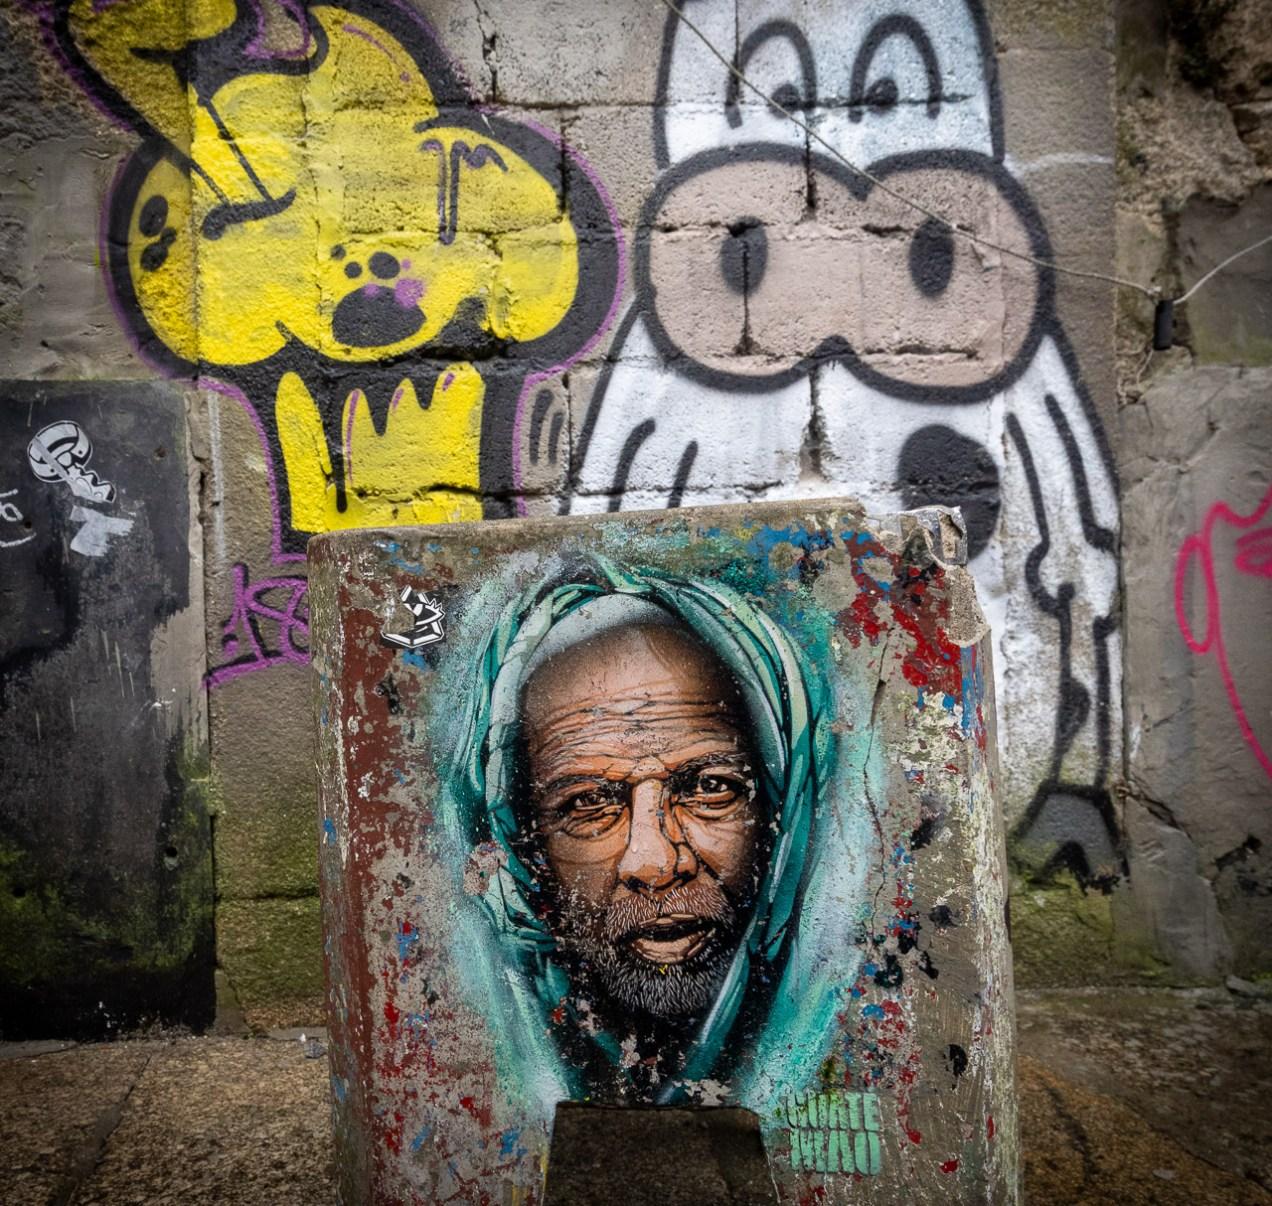 The Face in the Graffiti